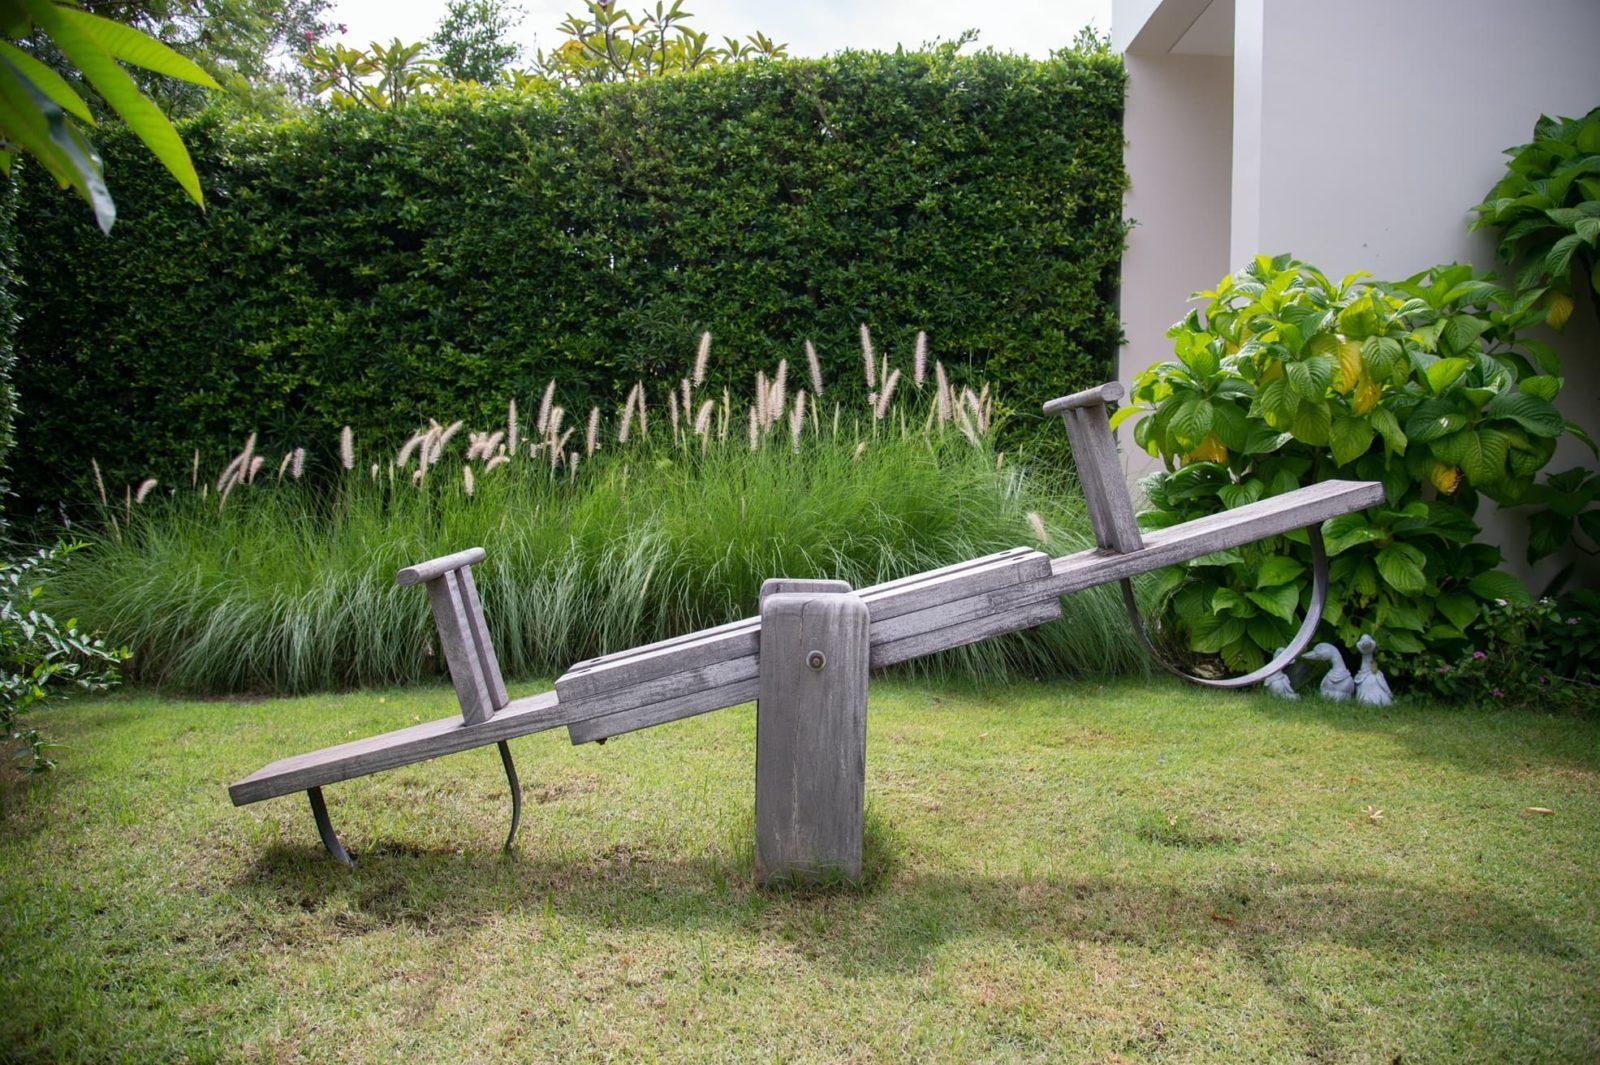 wooden seesaw in garden